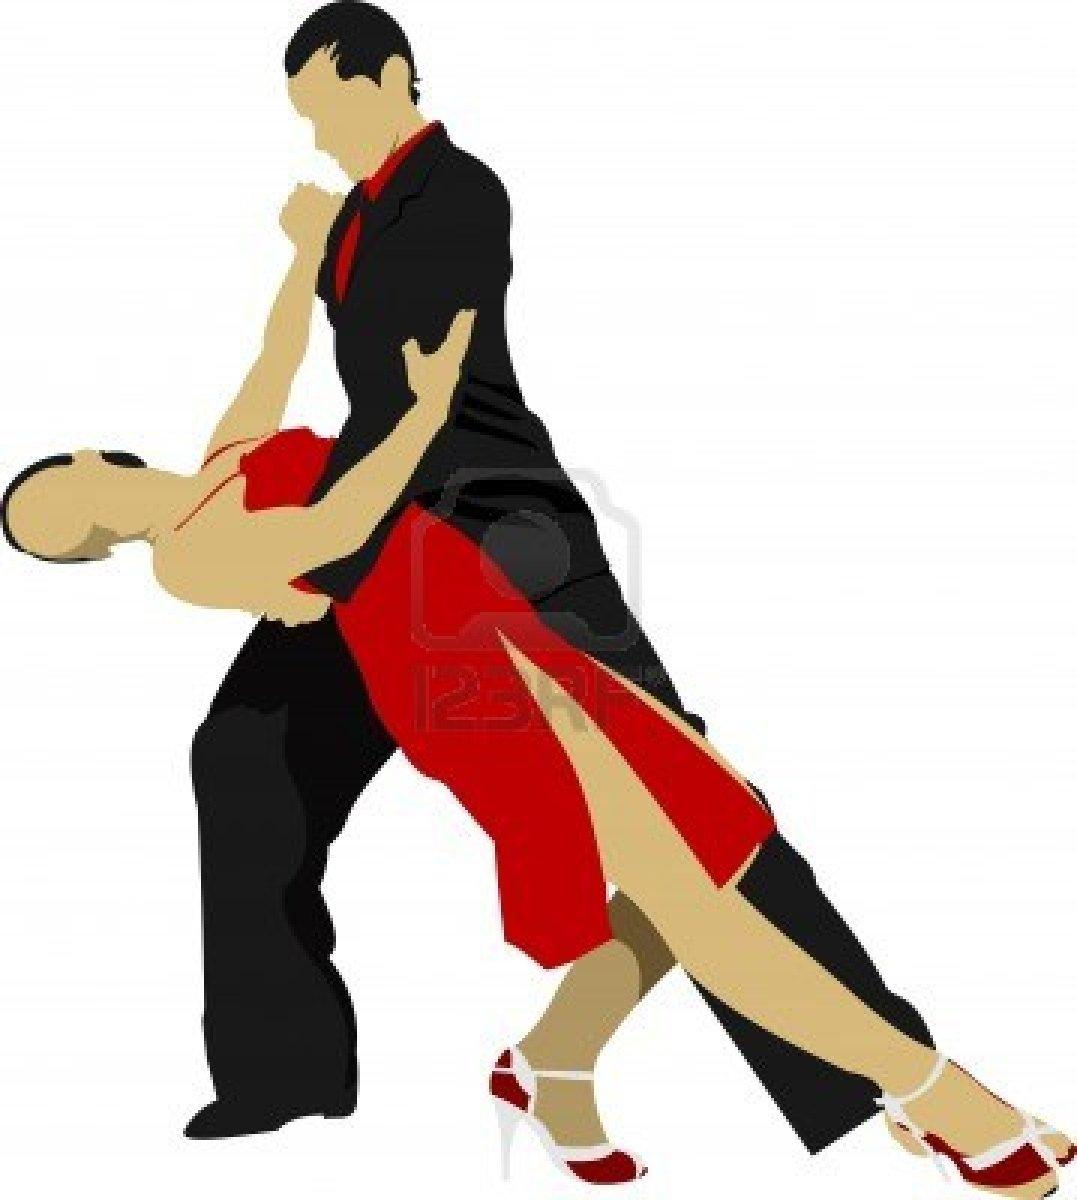 ballroom dancing clip art - photo #10